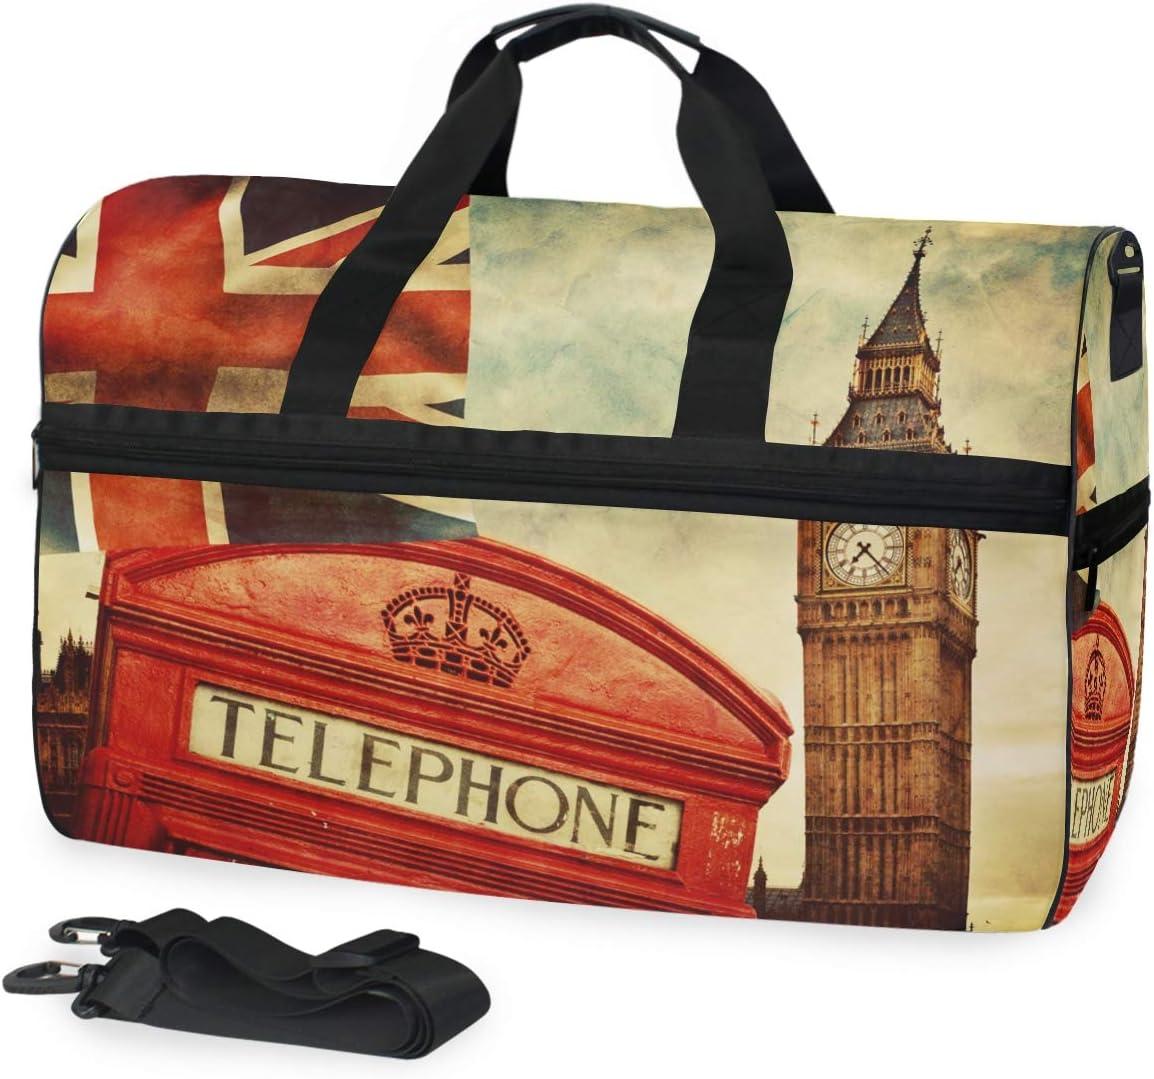 TFONE England London Theme Duffel Bag Sports Gym Weekend Bags with Shoe Compartmen